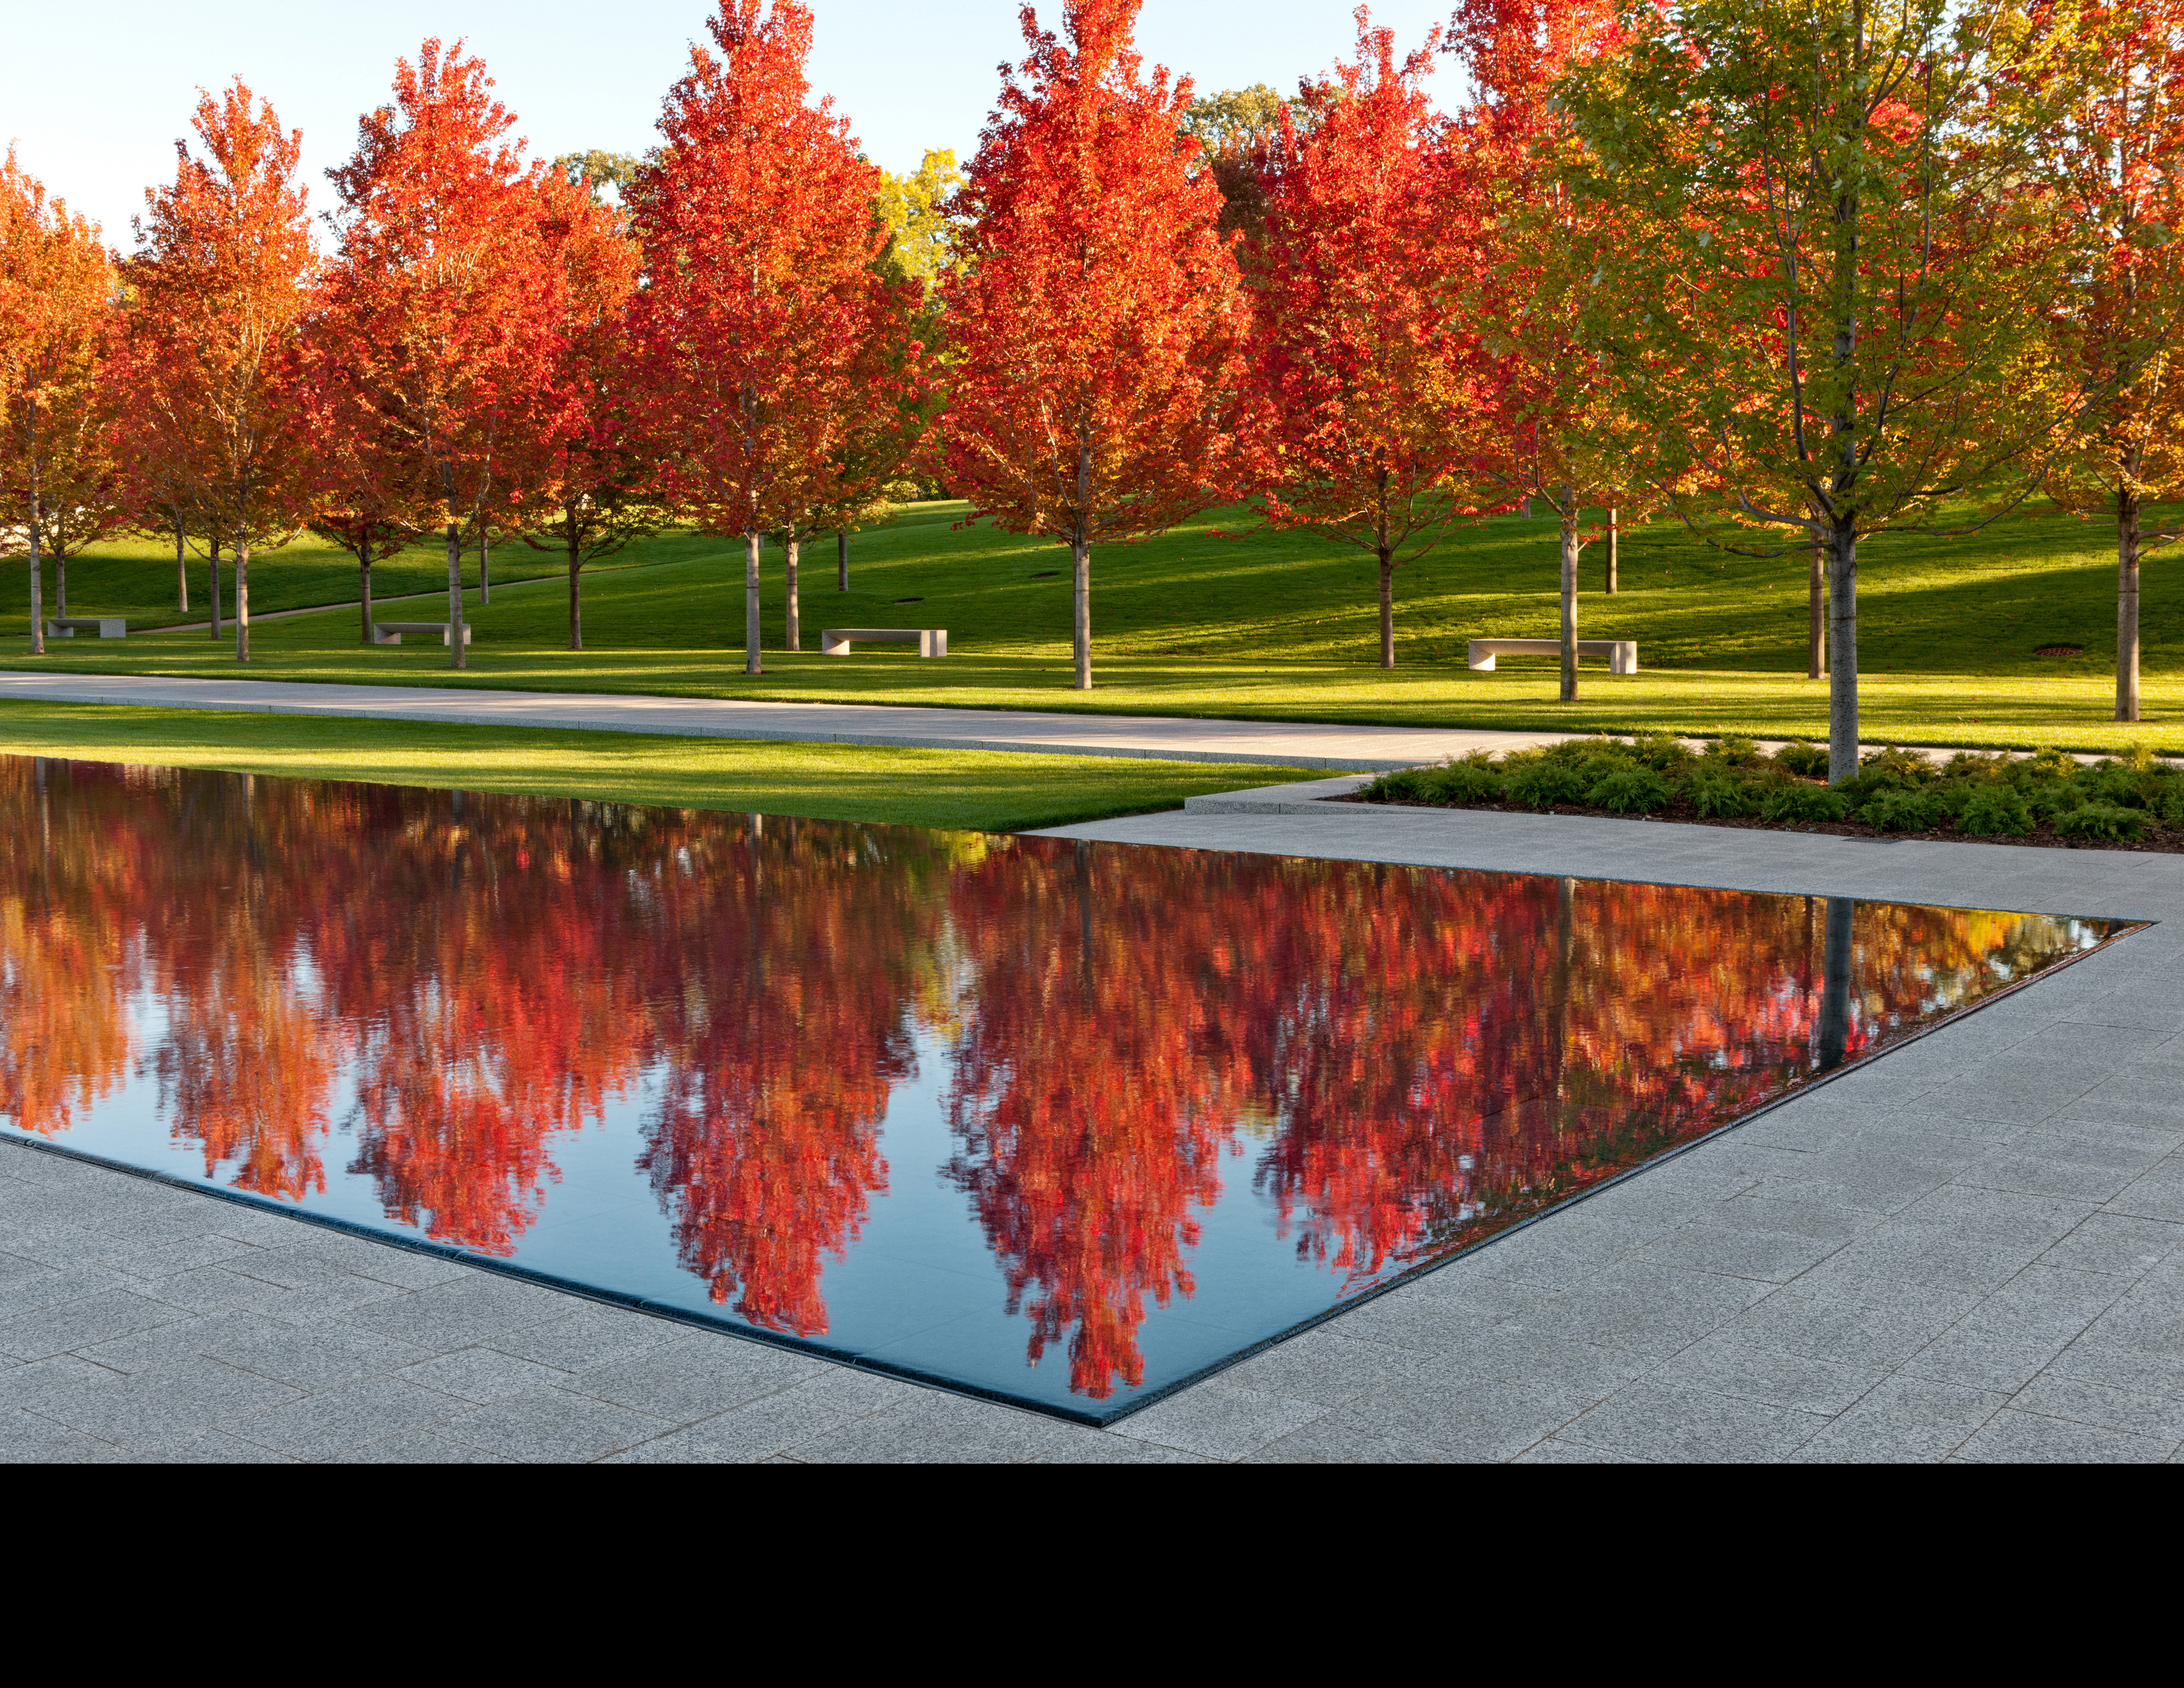 Asla 2013 professional awards lakewood garden mausoleum for Garden reflecting pool